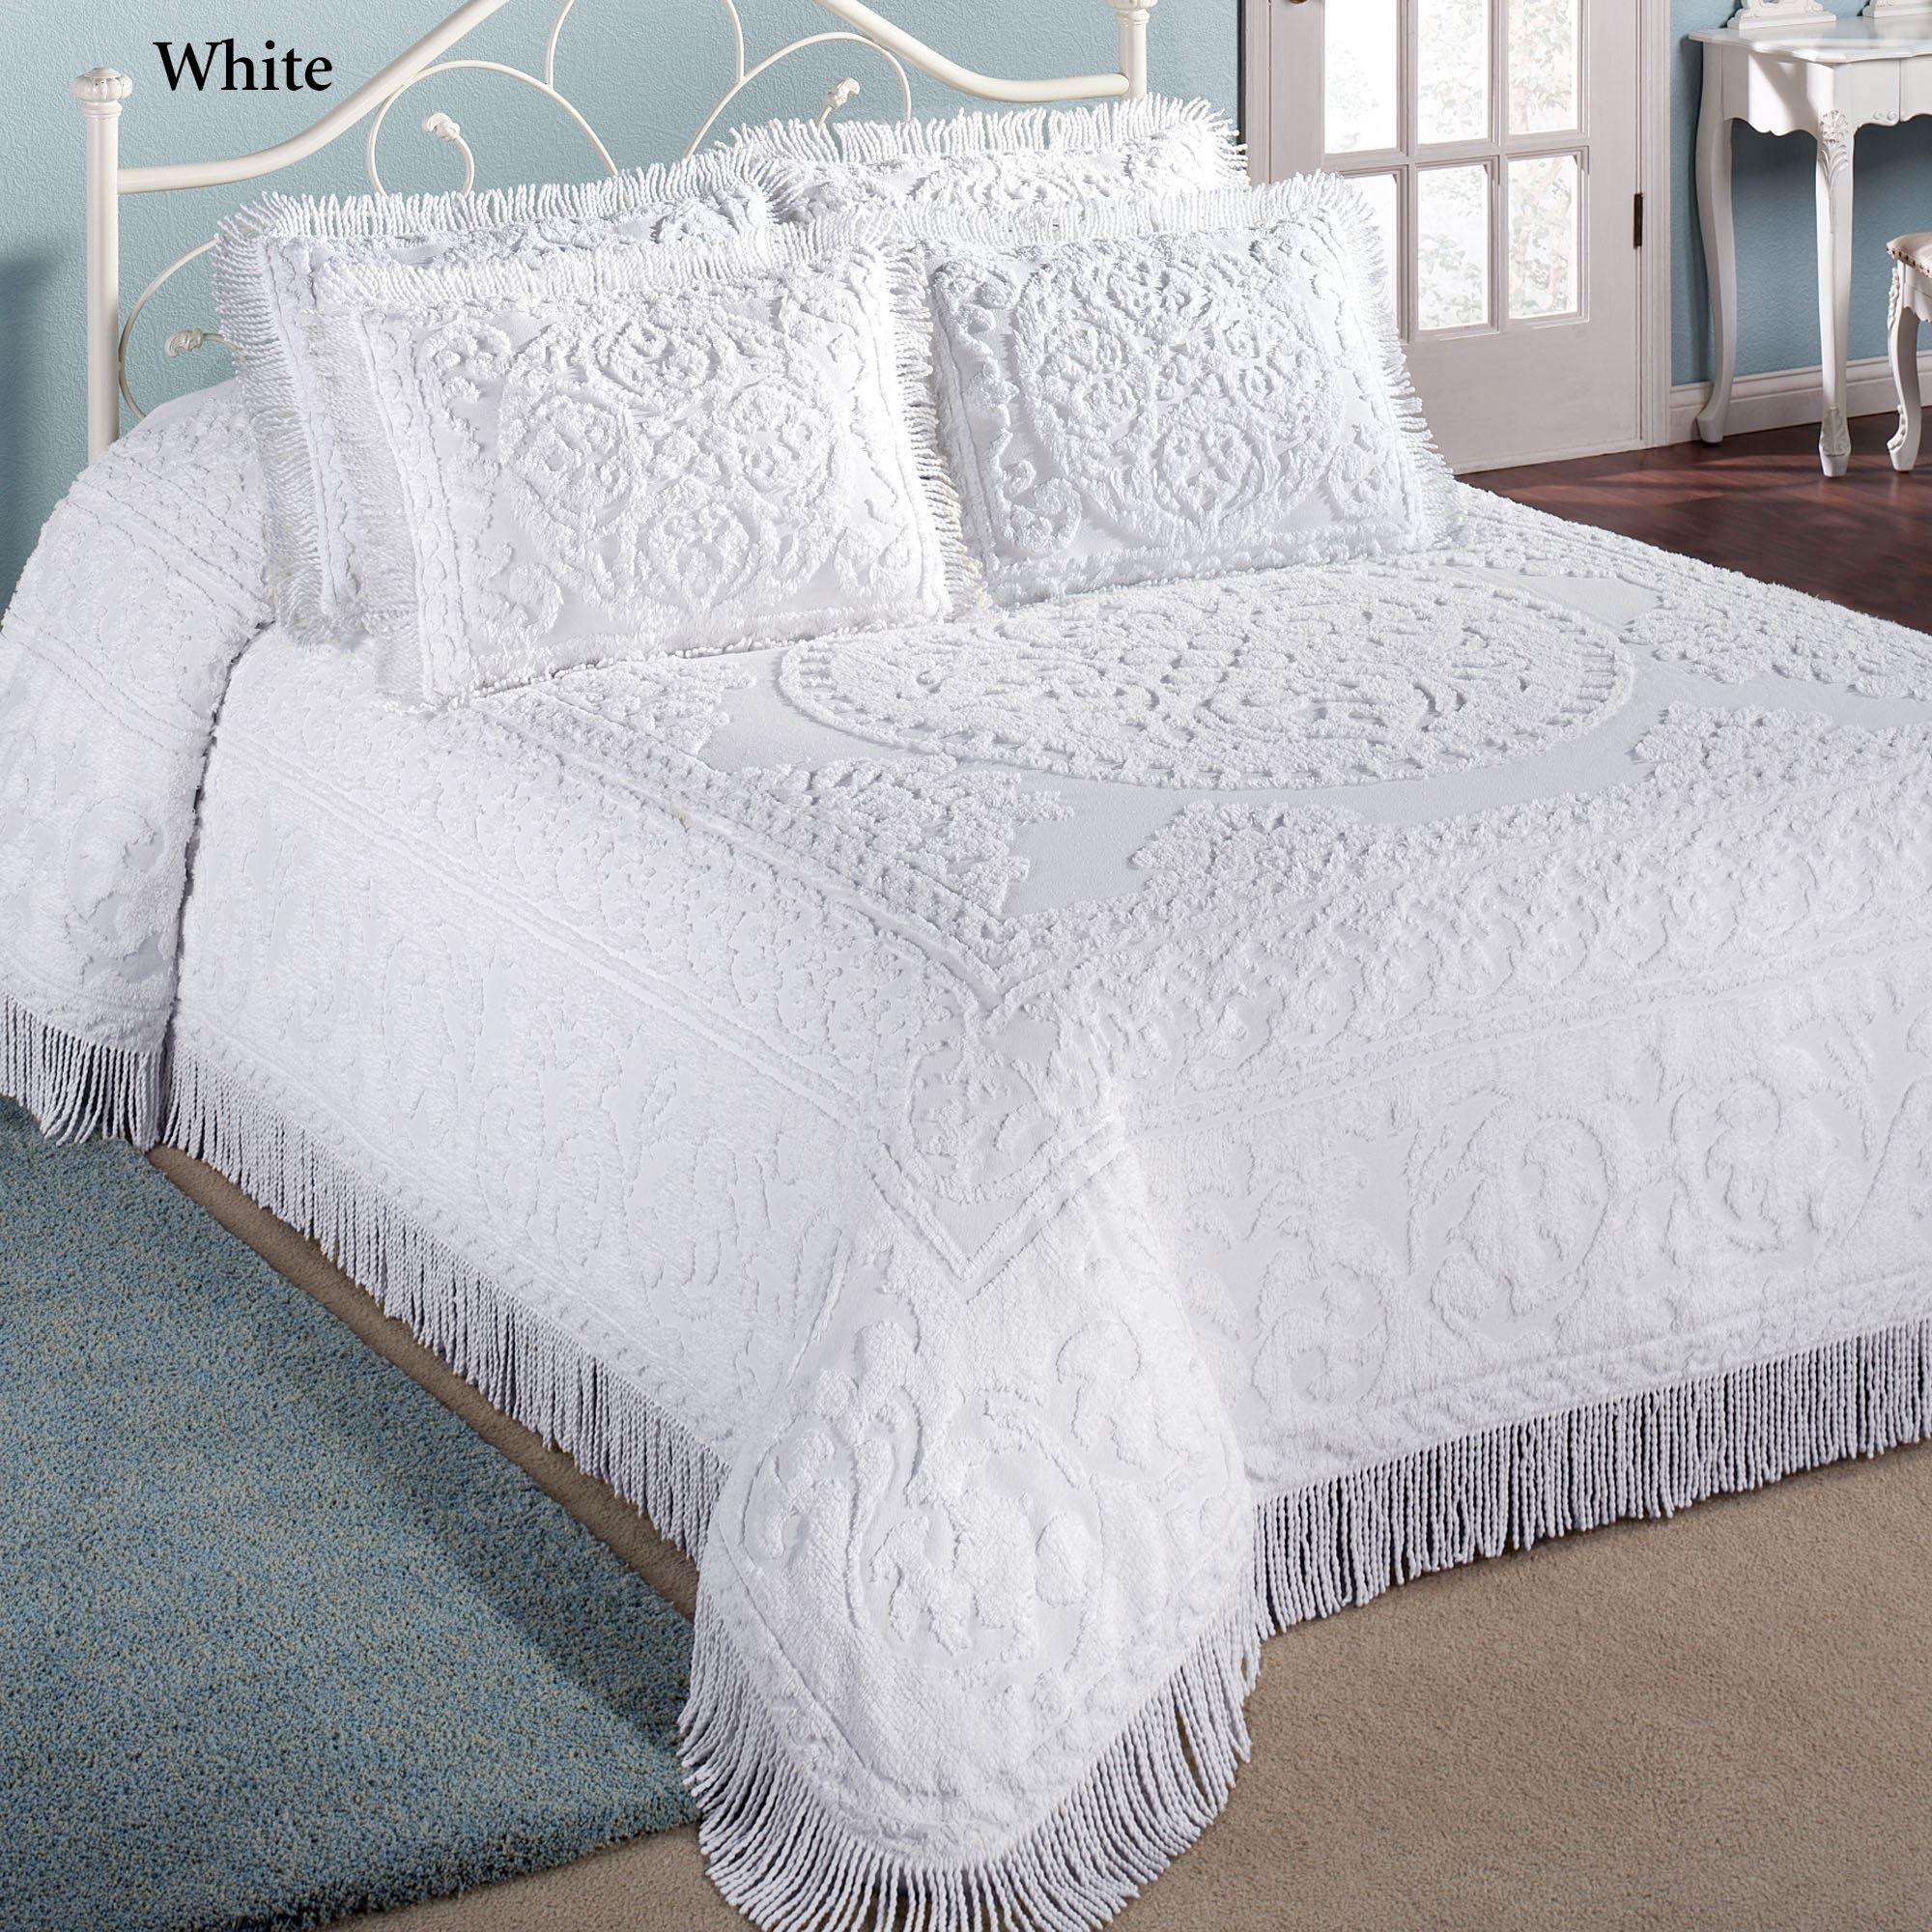 Cotton chenille medallion bedspread bedding bed spreads